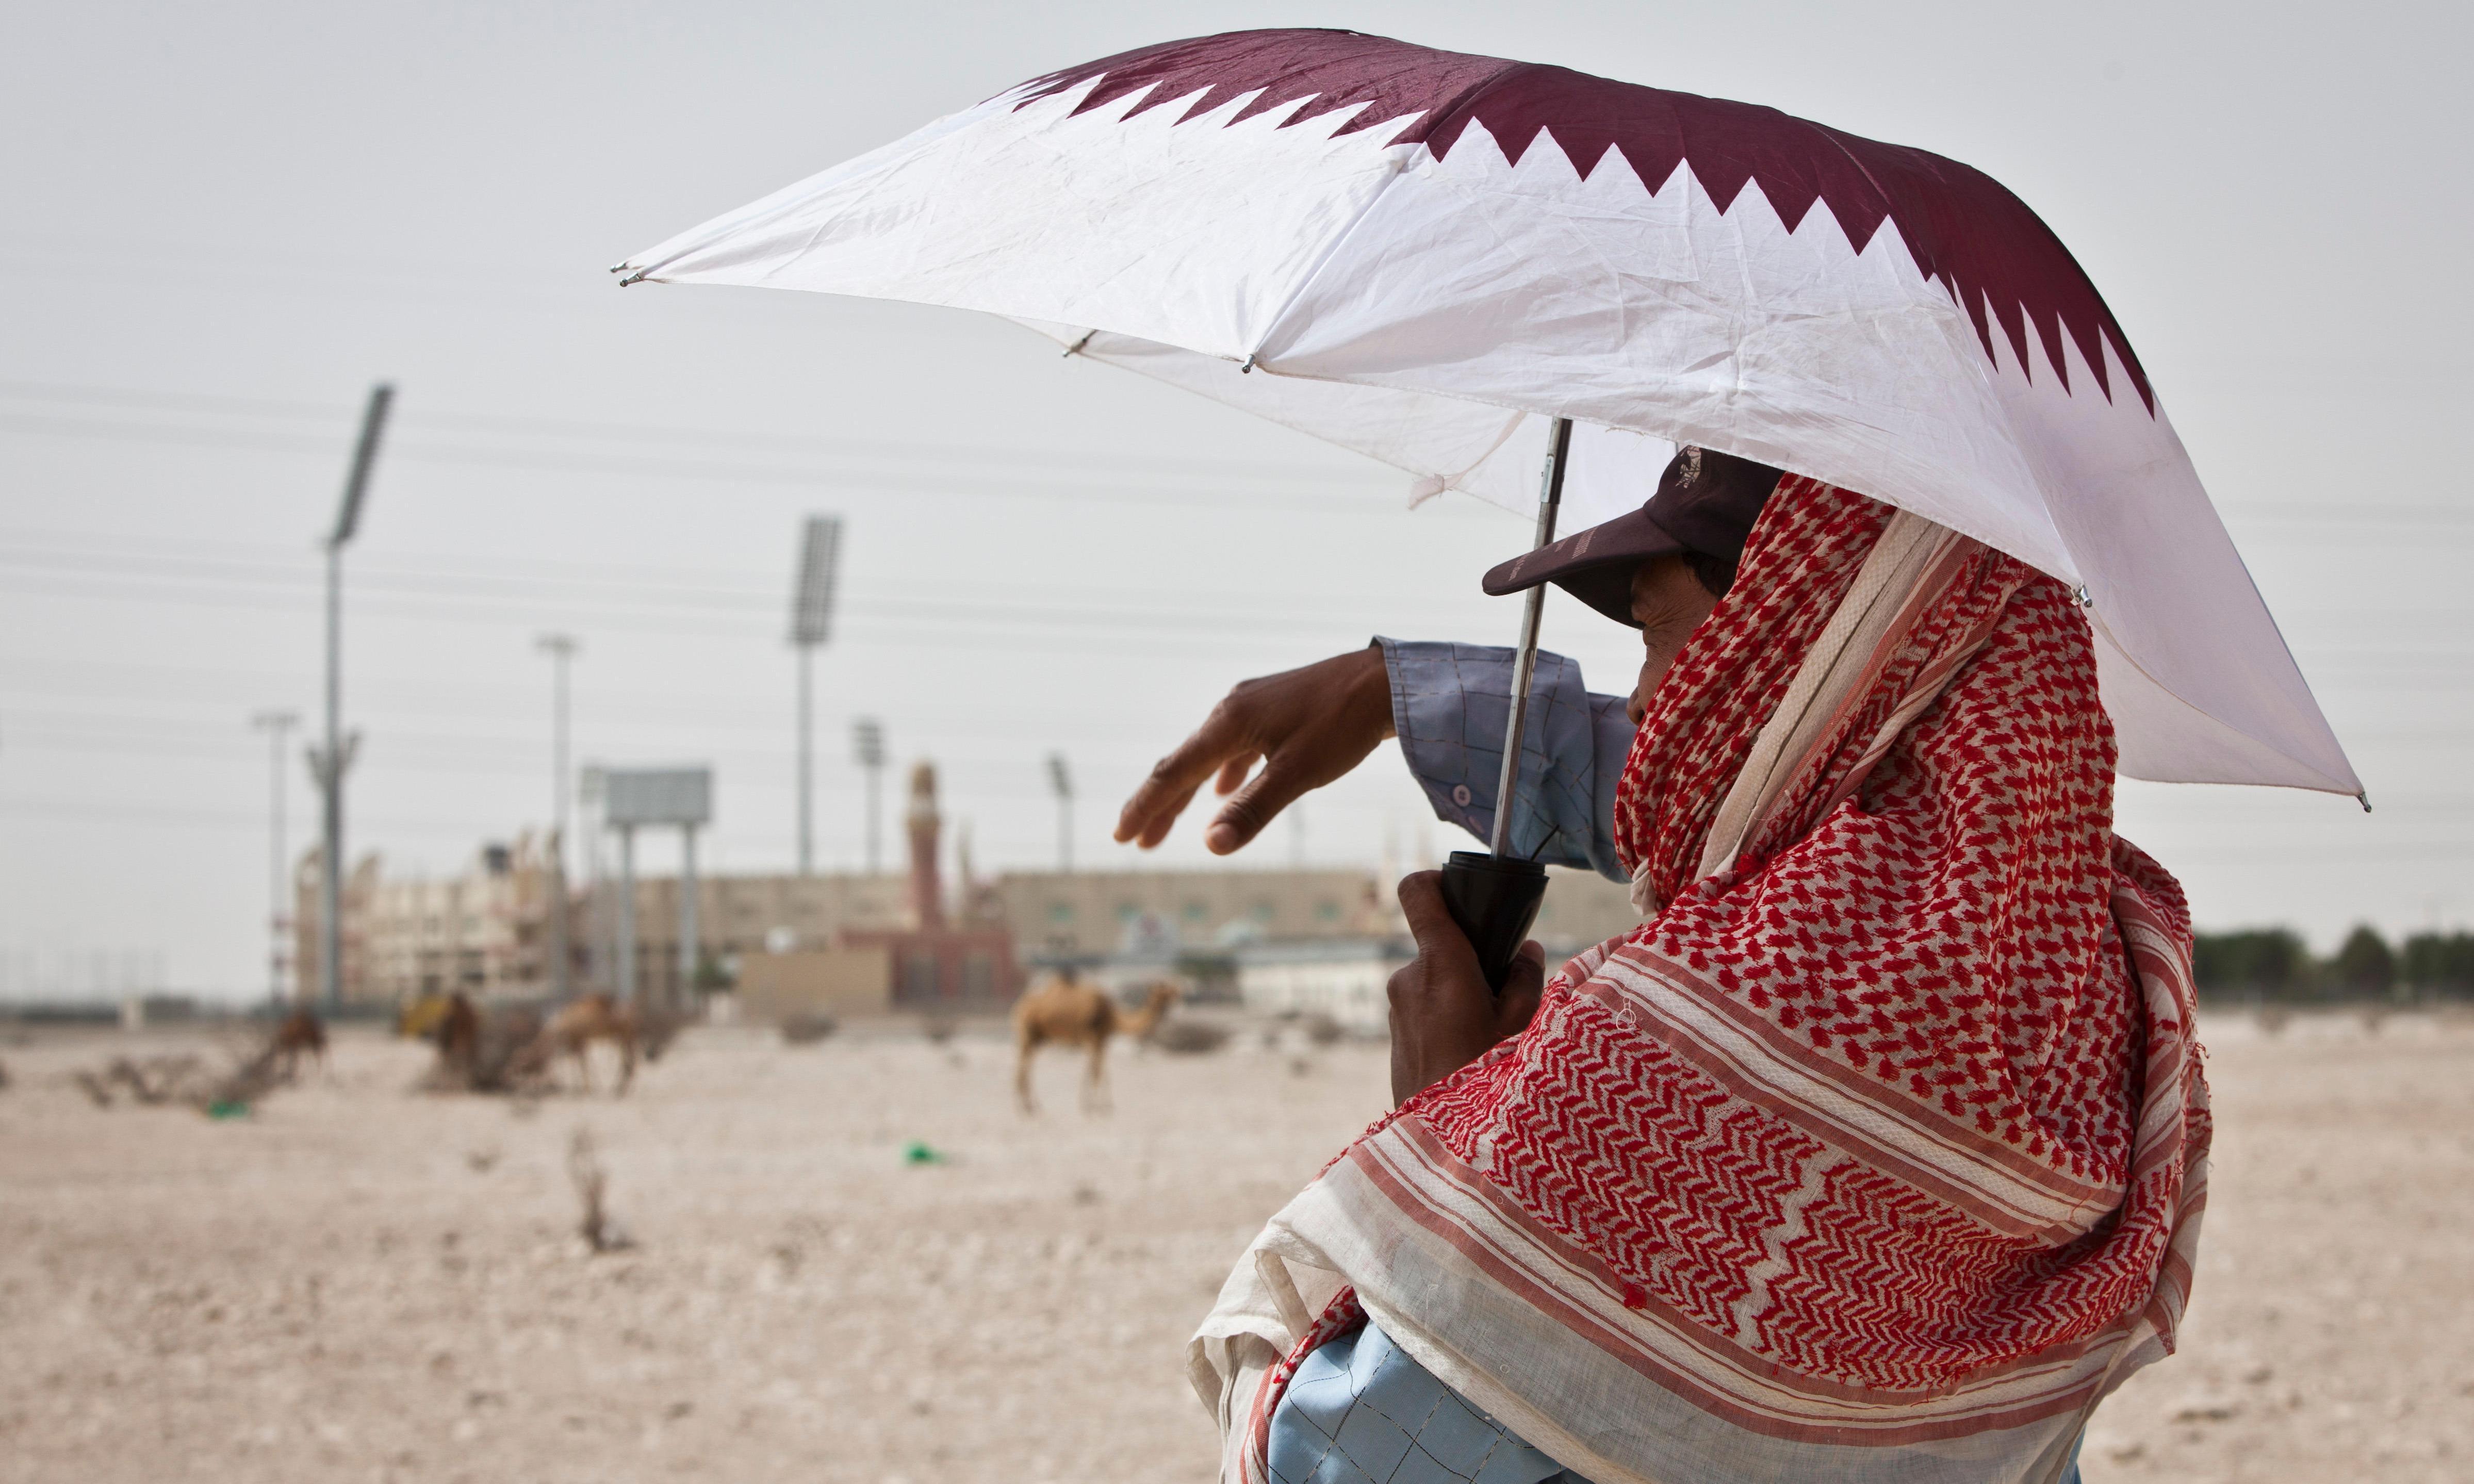 Qatar to abolish 'kafala' labour system next January ahead of 2022 World Cup